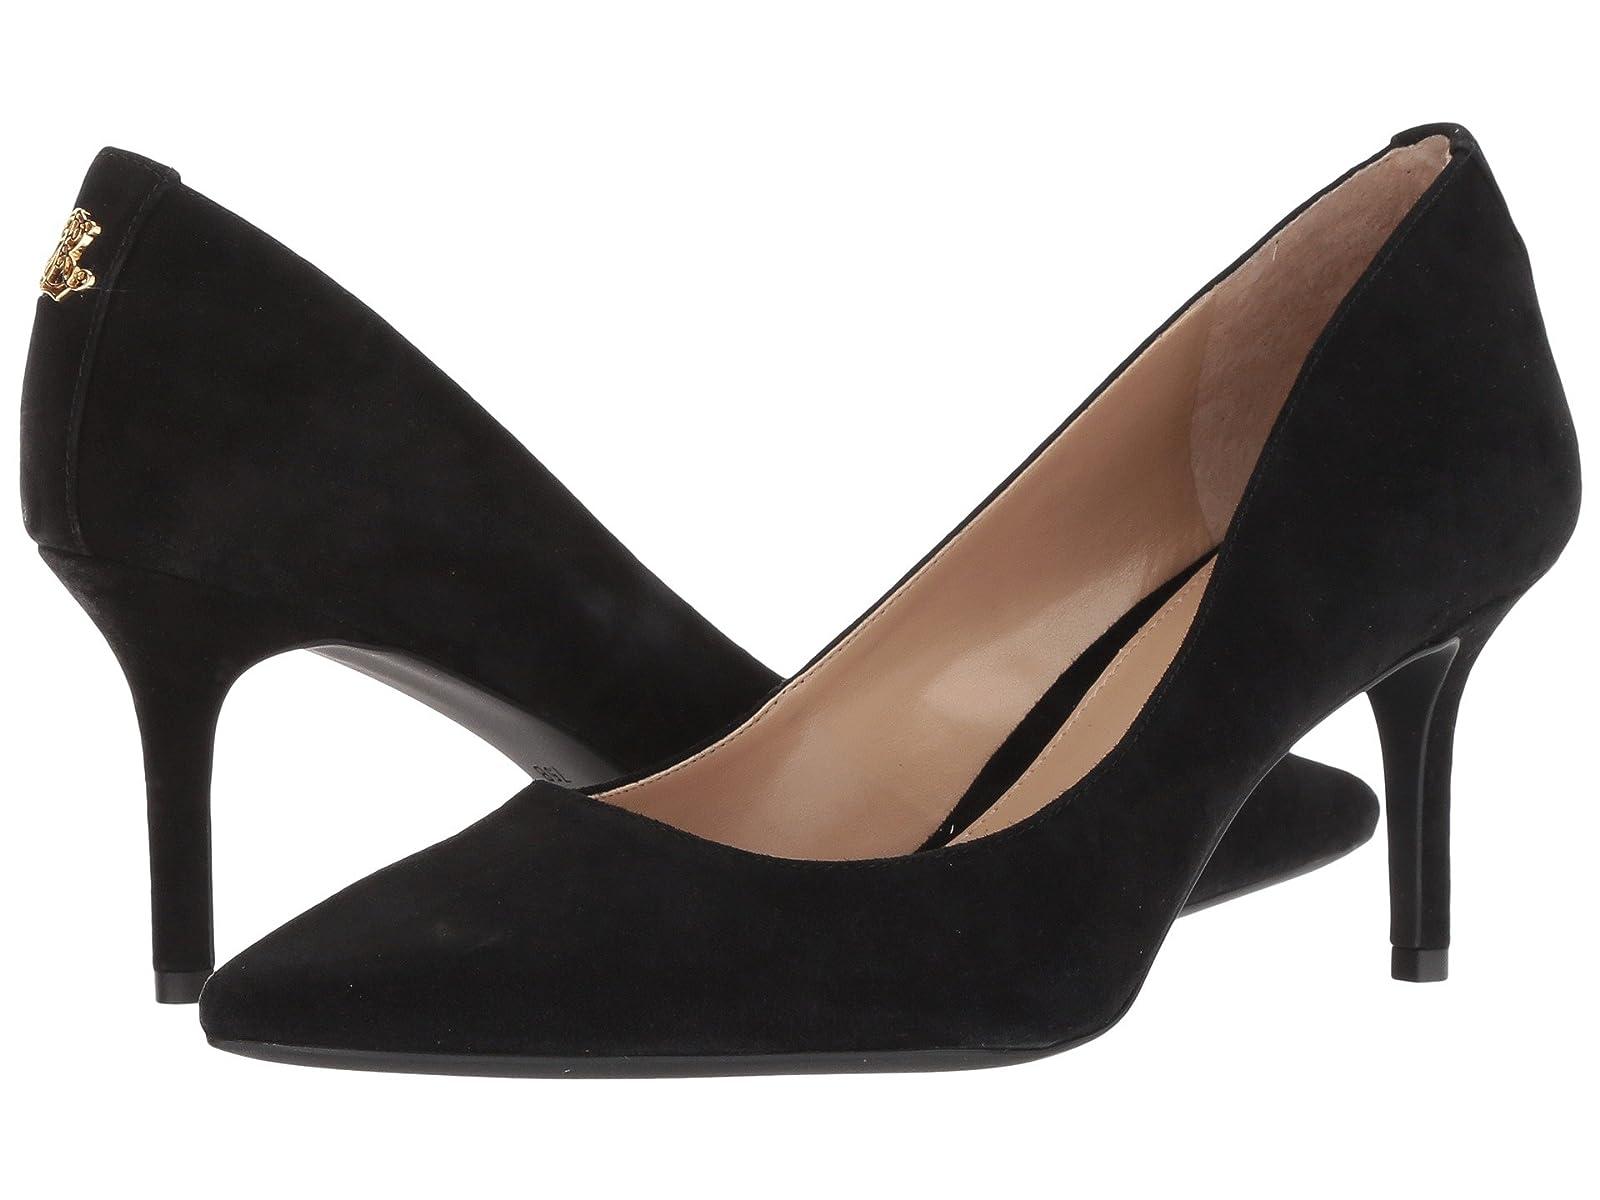 LAUREN Ralph Lauren LanetteAtmospheric grades have affordable shoes